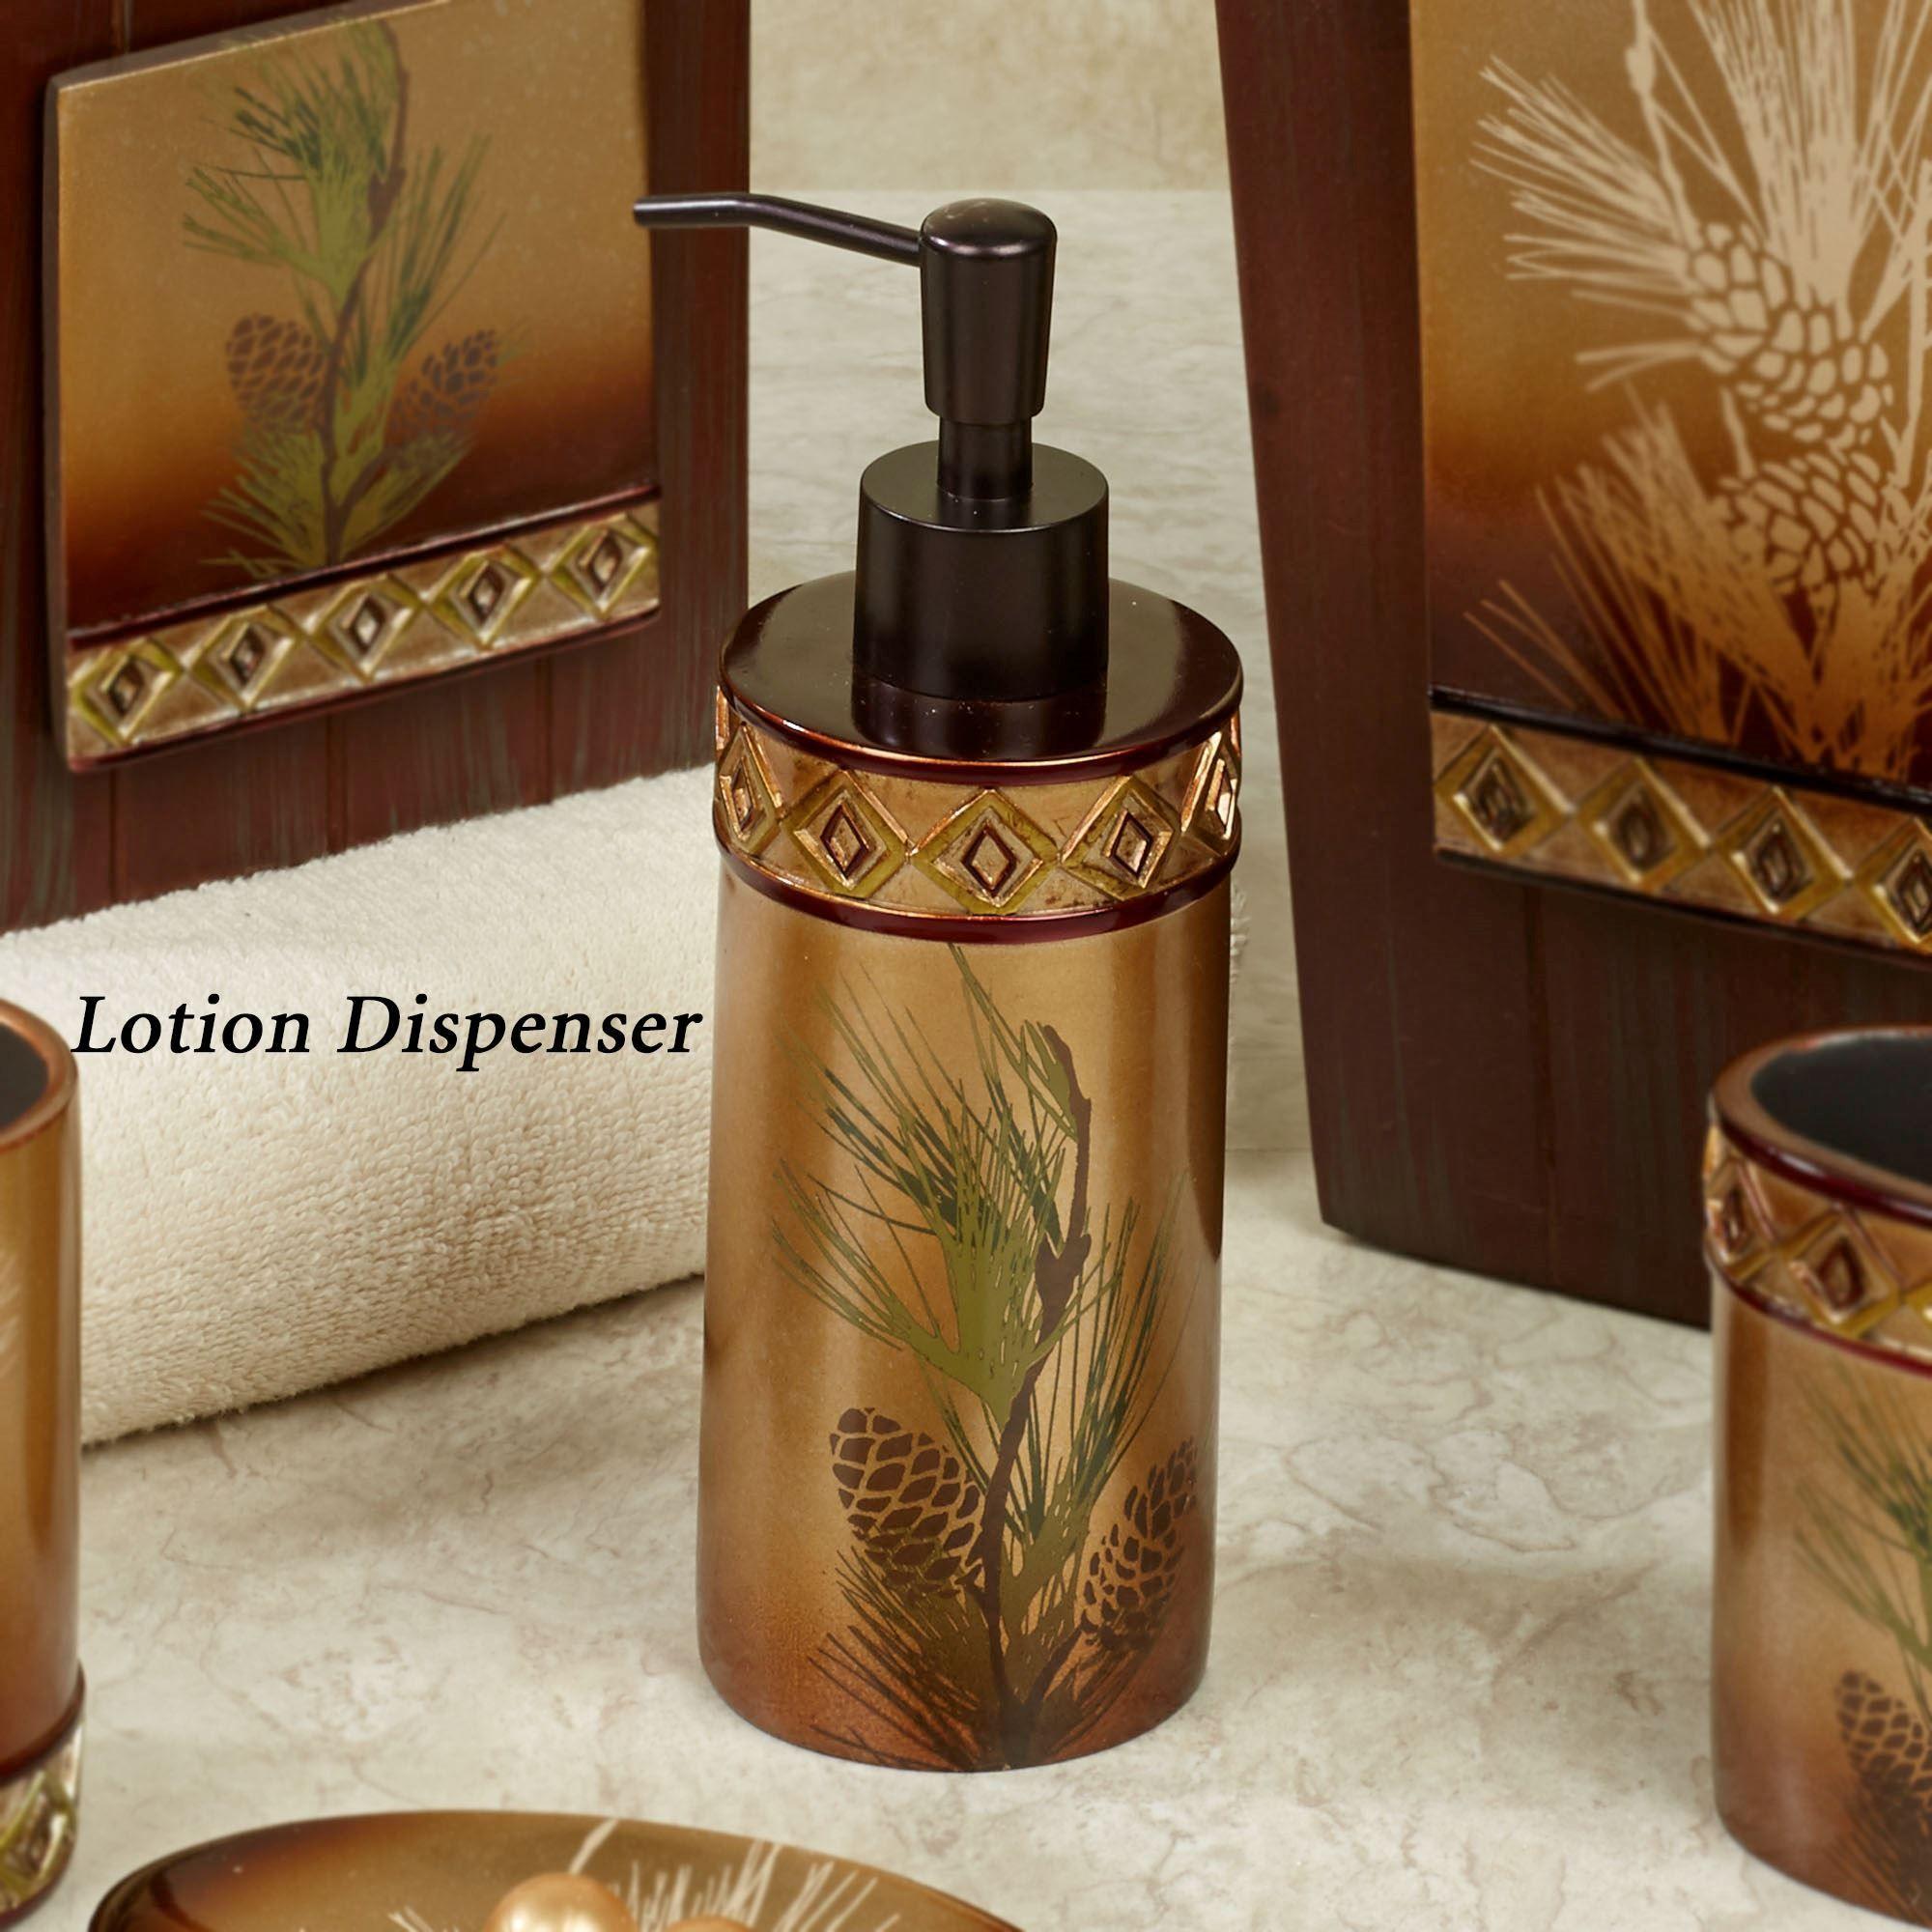 Merveilleux Pine Cone Silhouettes Lotion Soap Dispenser Brown